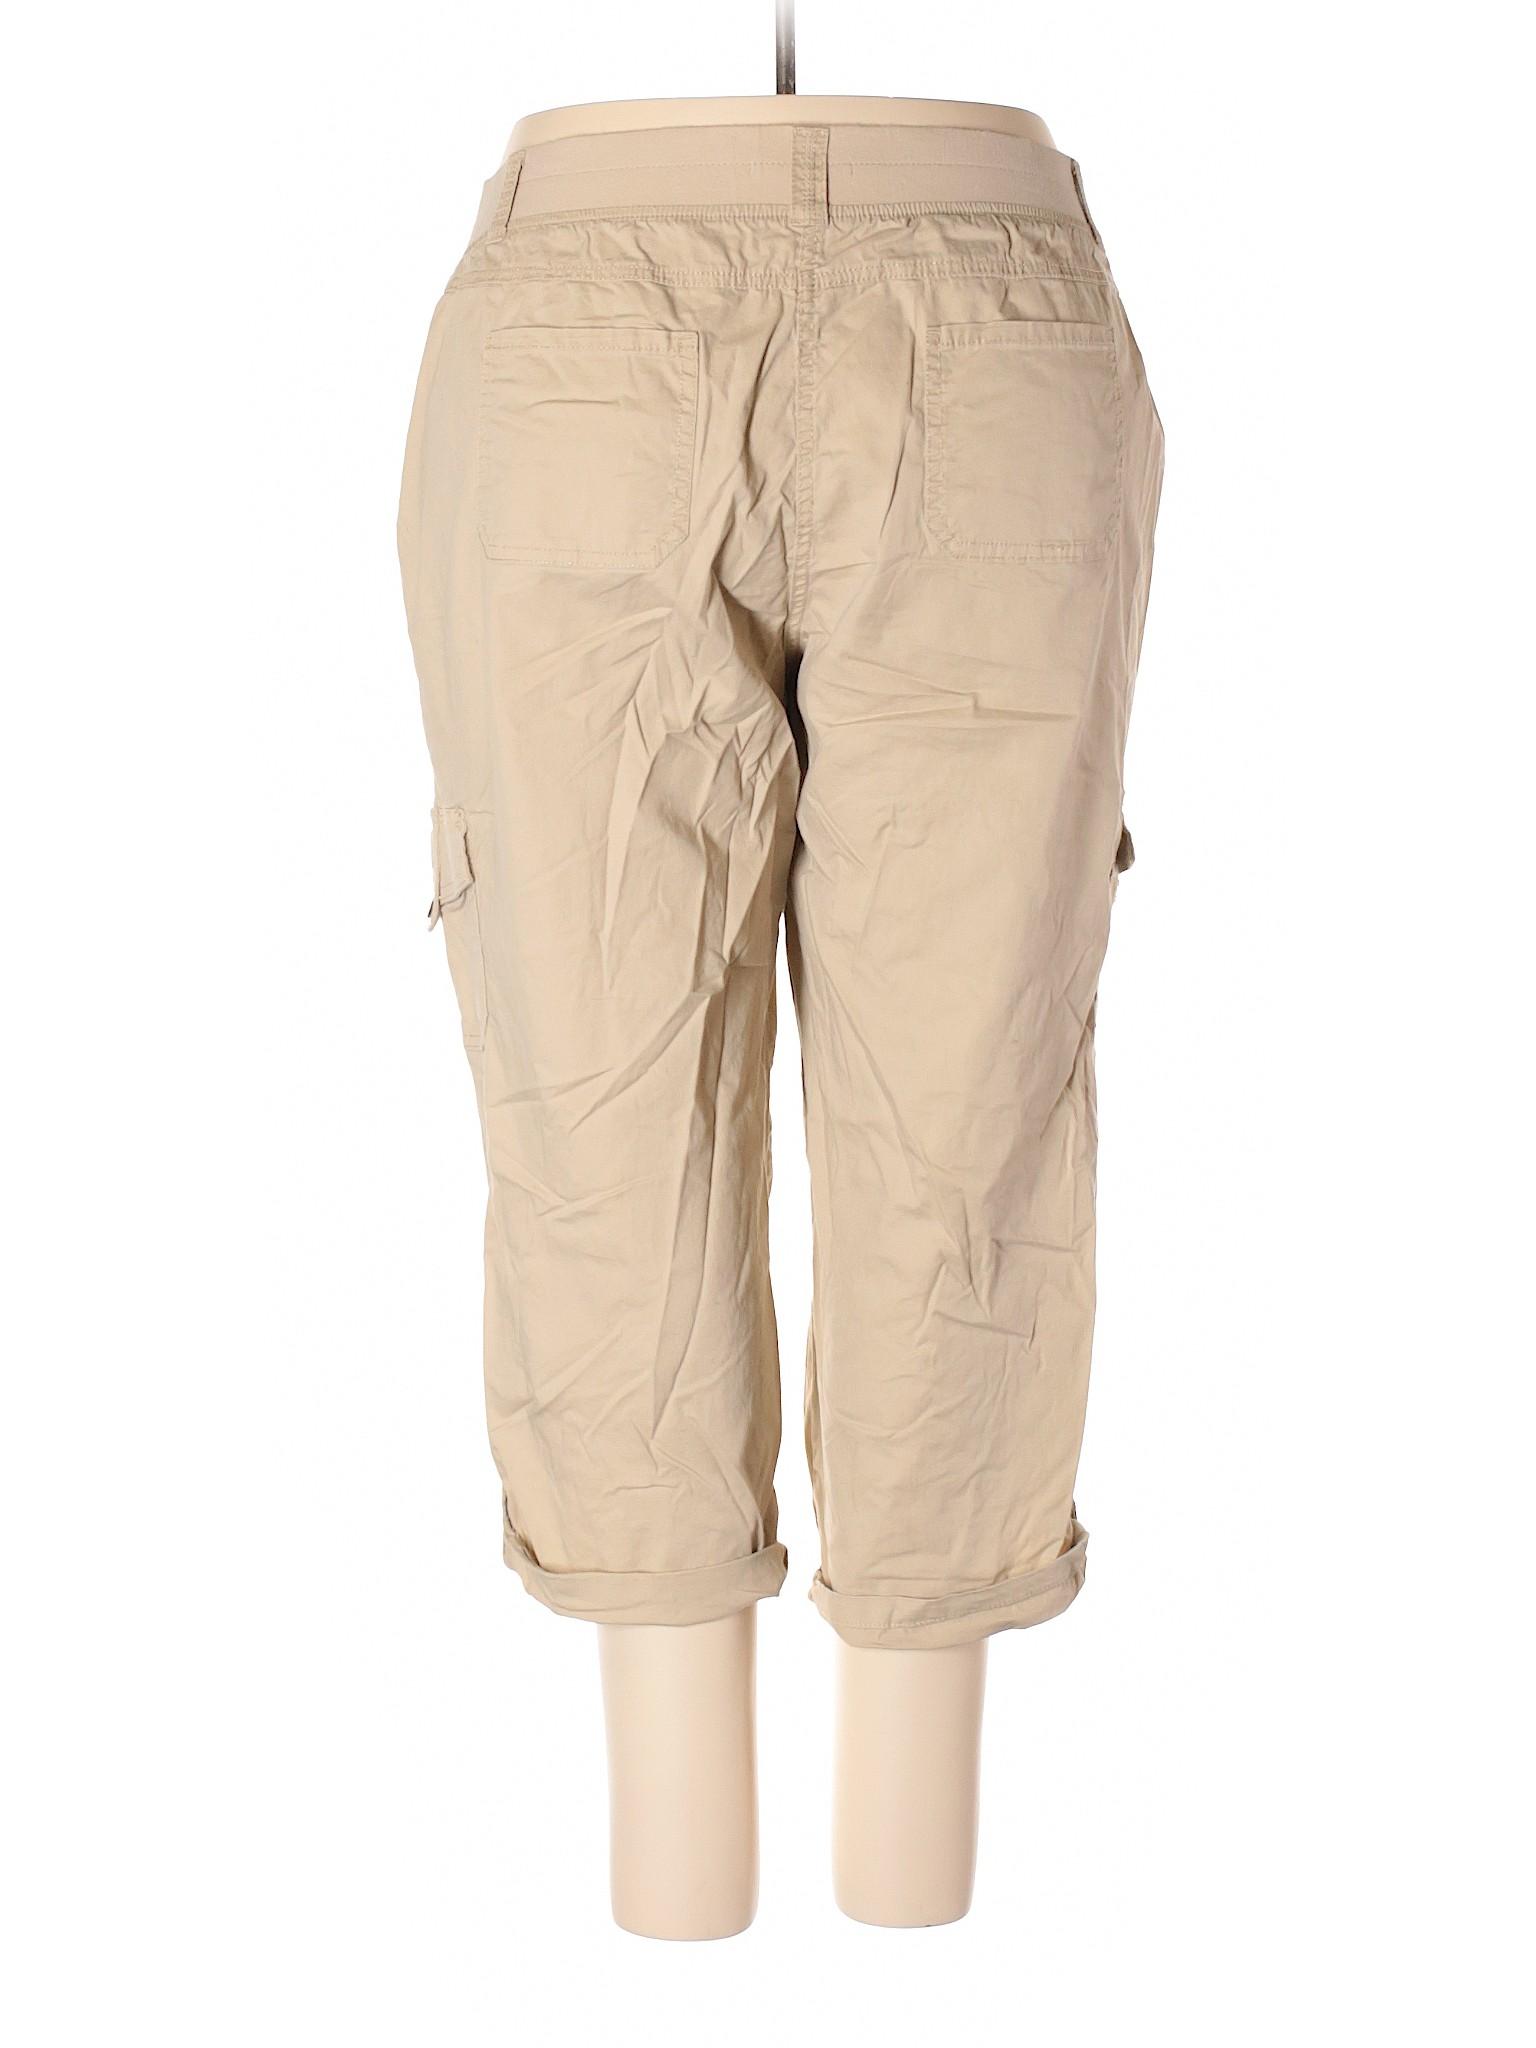 Relativity Pants Cargo leisure Pants Cargo Pants Boutique Relativity Relativity Cargo leisure Boutique leisure Boutique leisure Boutique RZxff4w